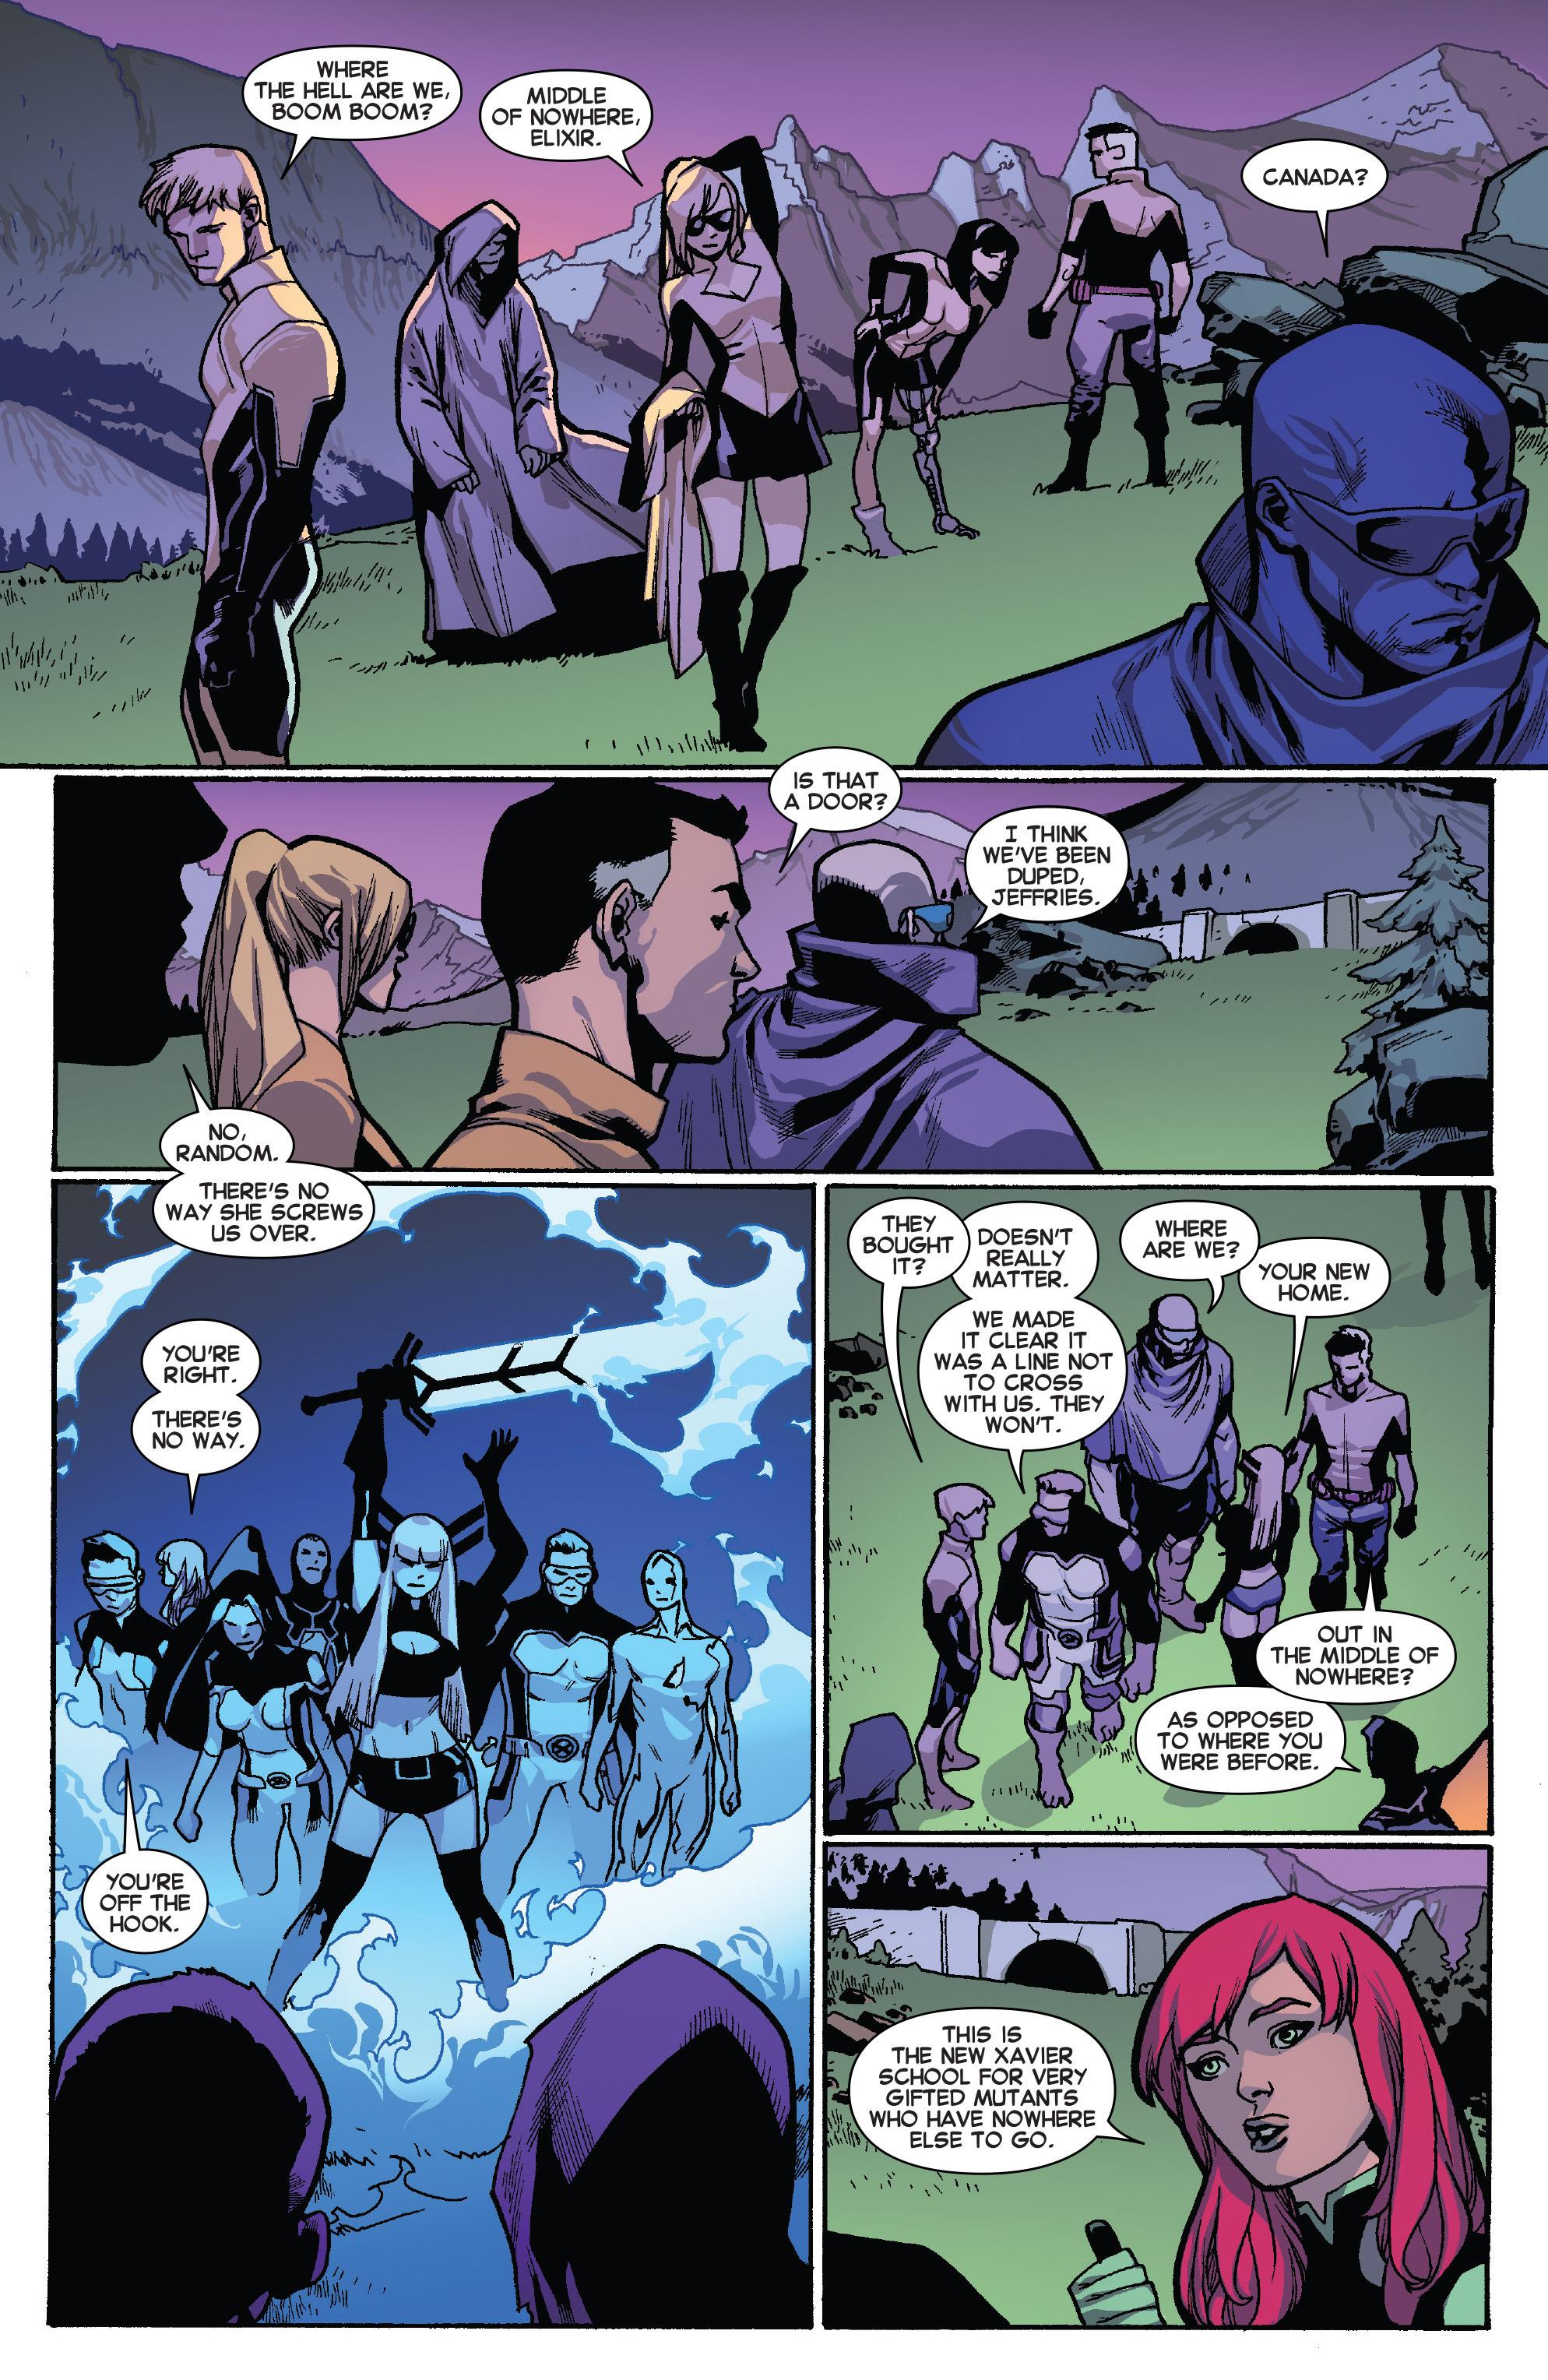 All-New X-Men (2013) chap 41 pic 19